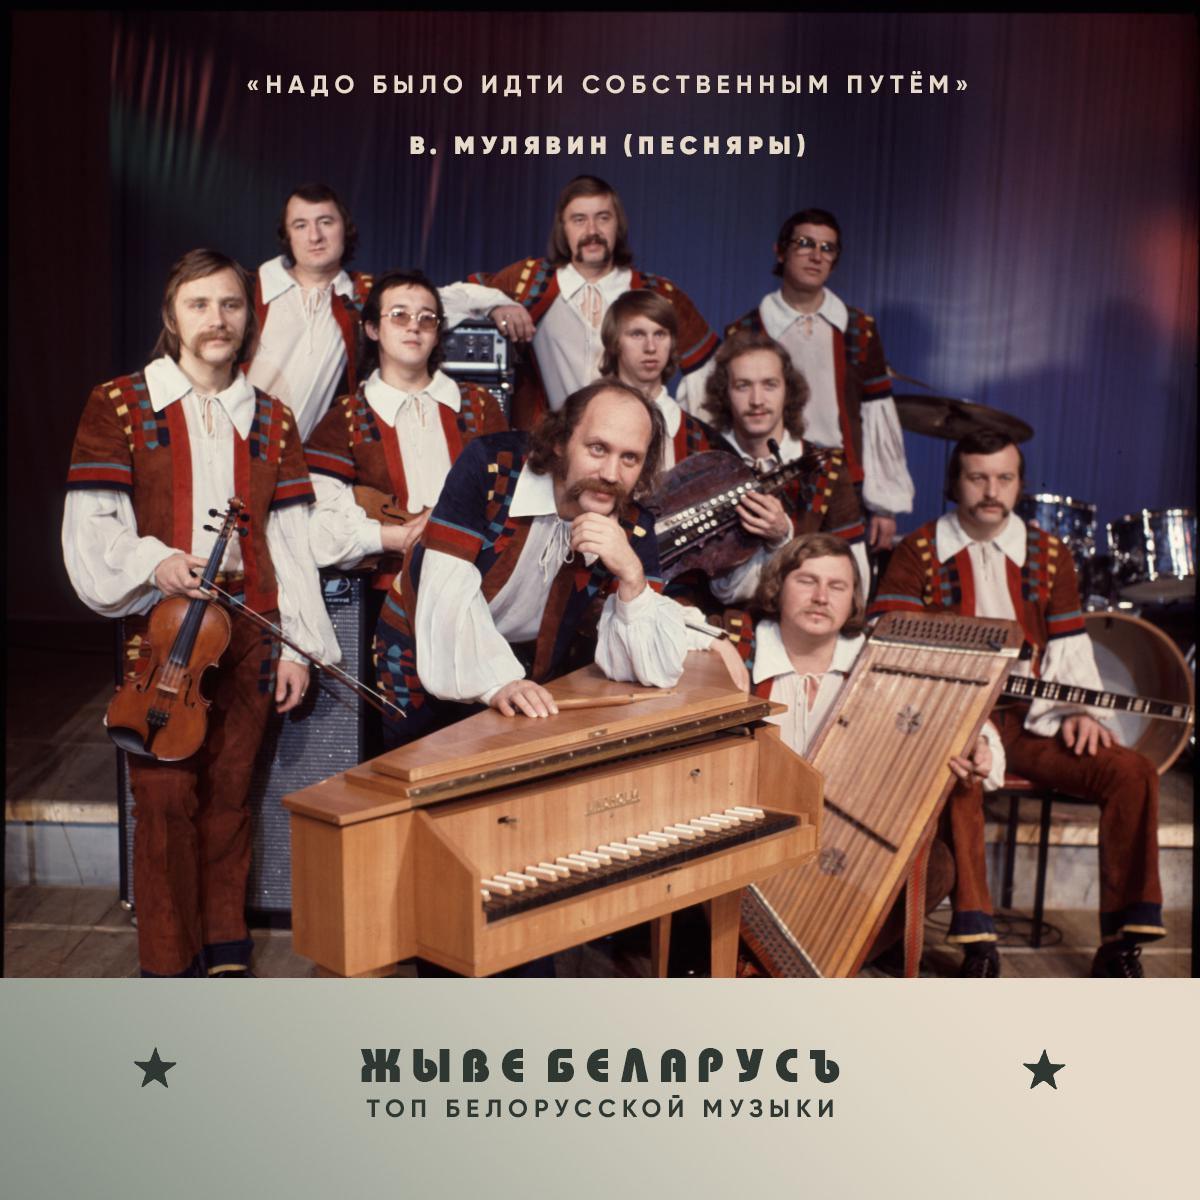 белорусская музыка